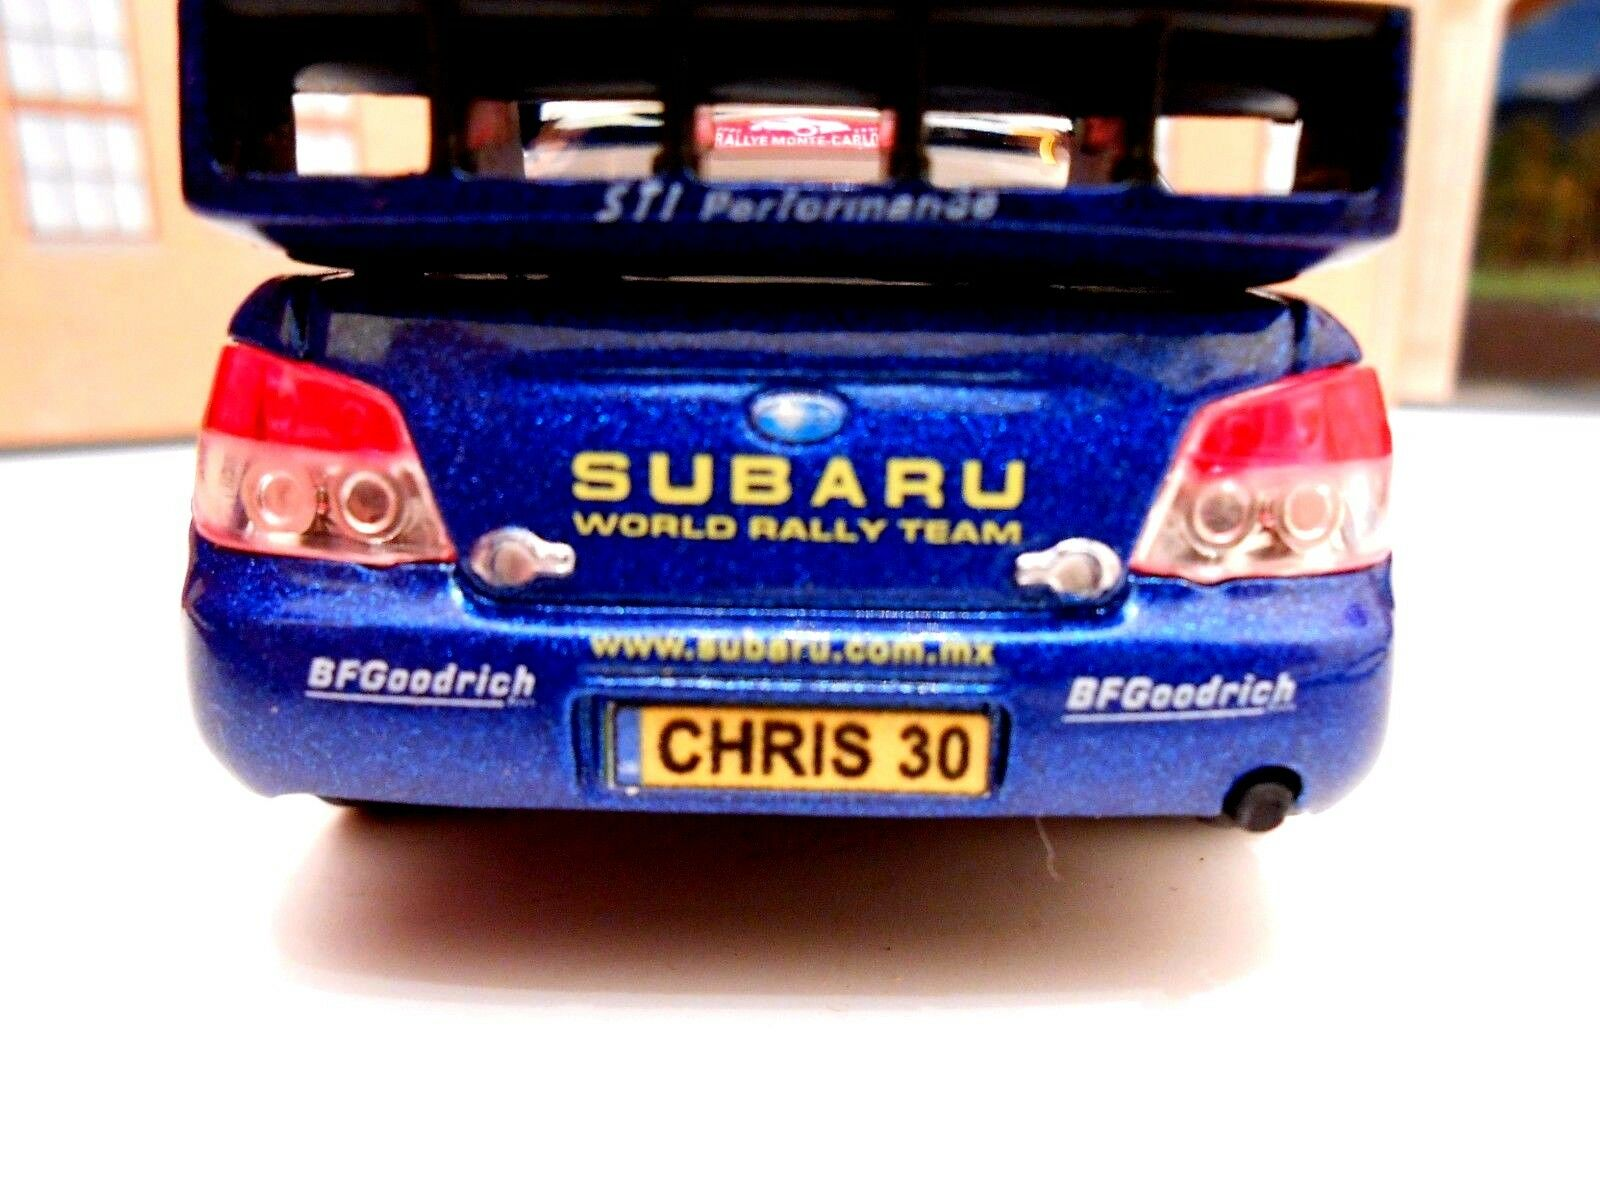 Subaru impreza $150 christmas gift ideas